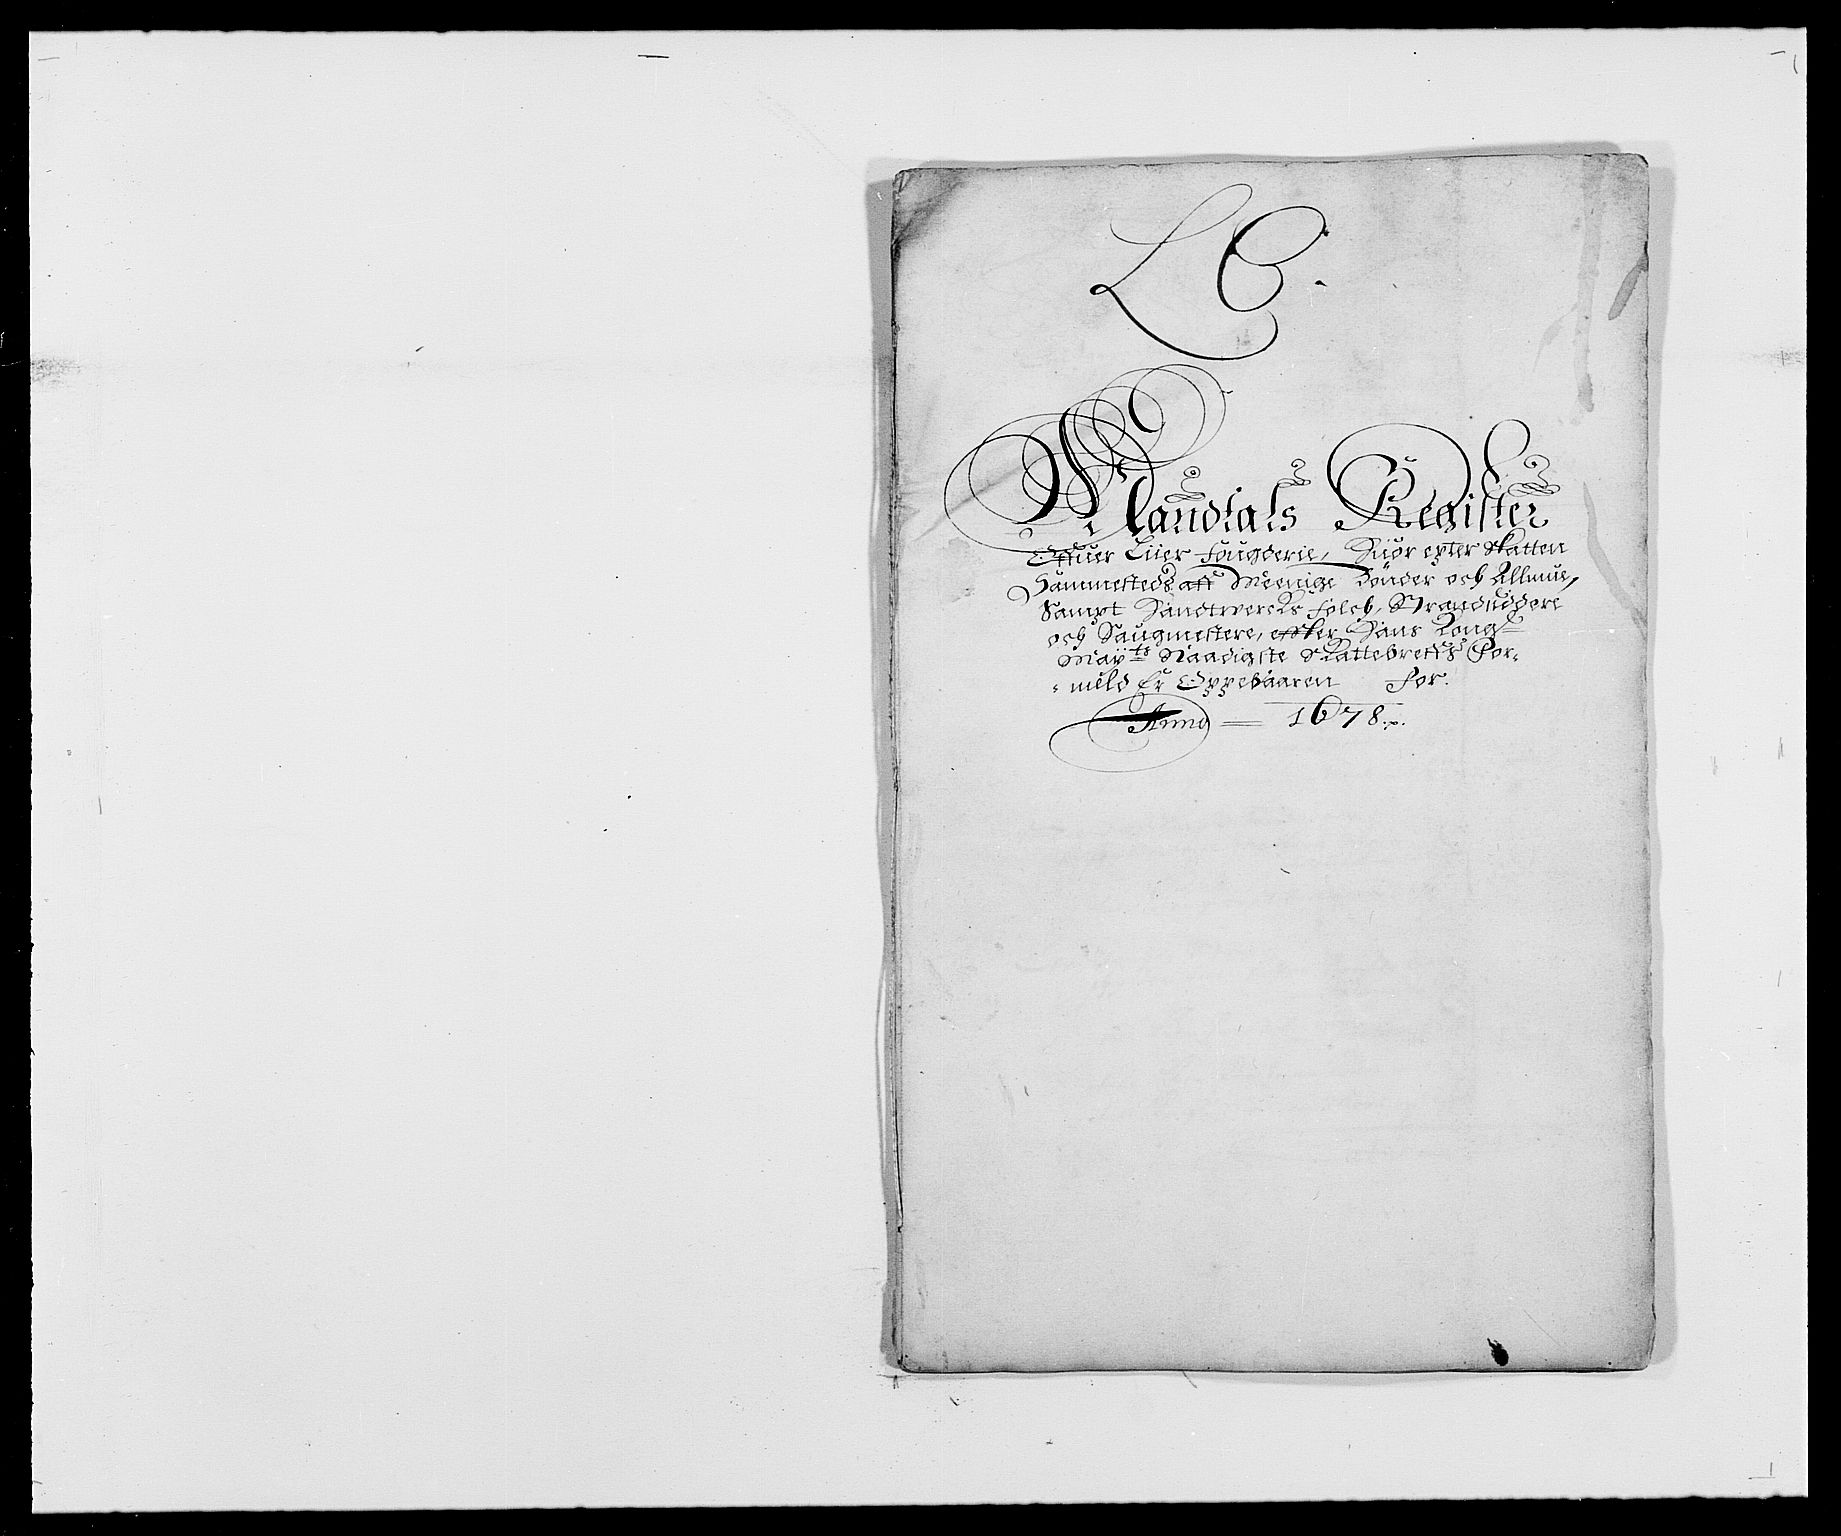 RA, Rentekammeret inntil 1814, Reviderte regnskaper, Fogderegnskap, R27/L1686: Fogderegnskap Lier, 1678-1686, s. 54